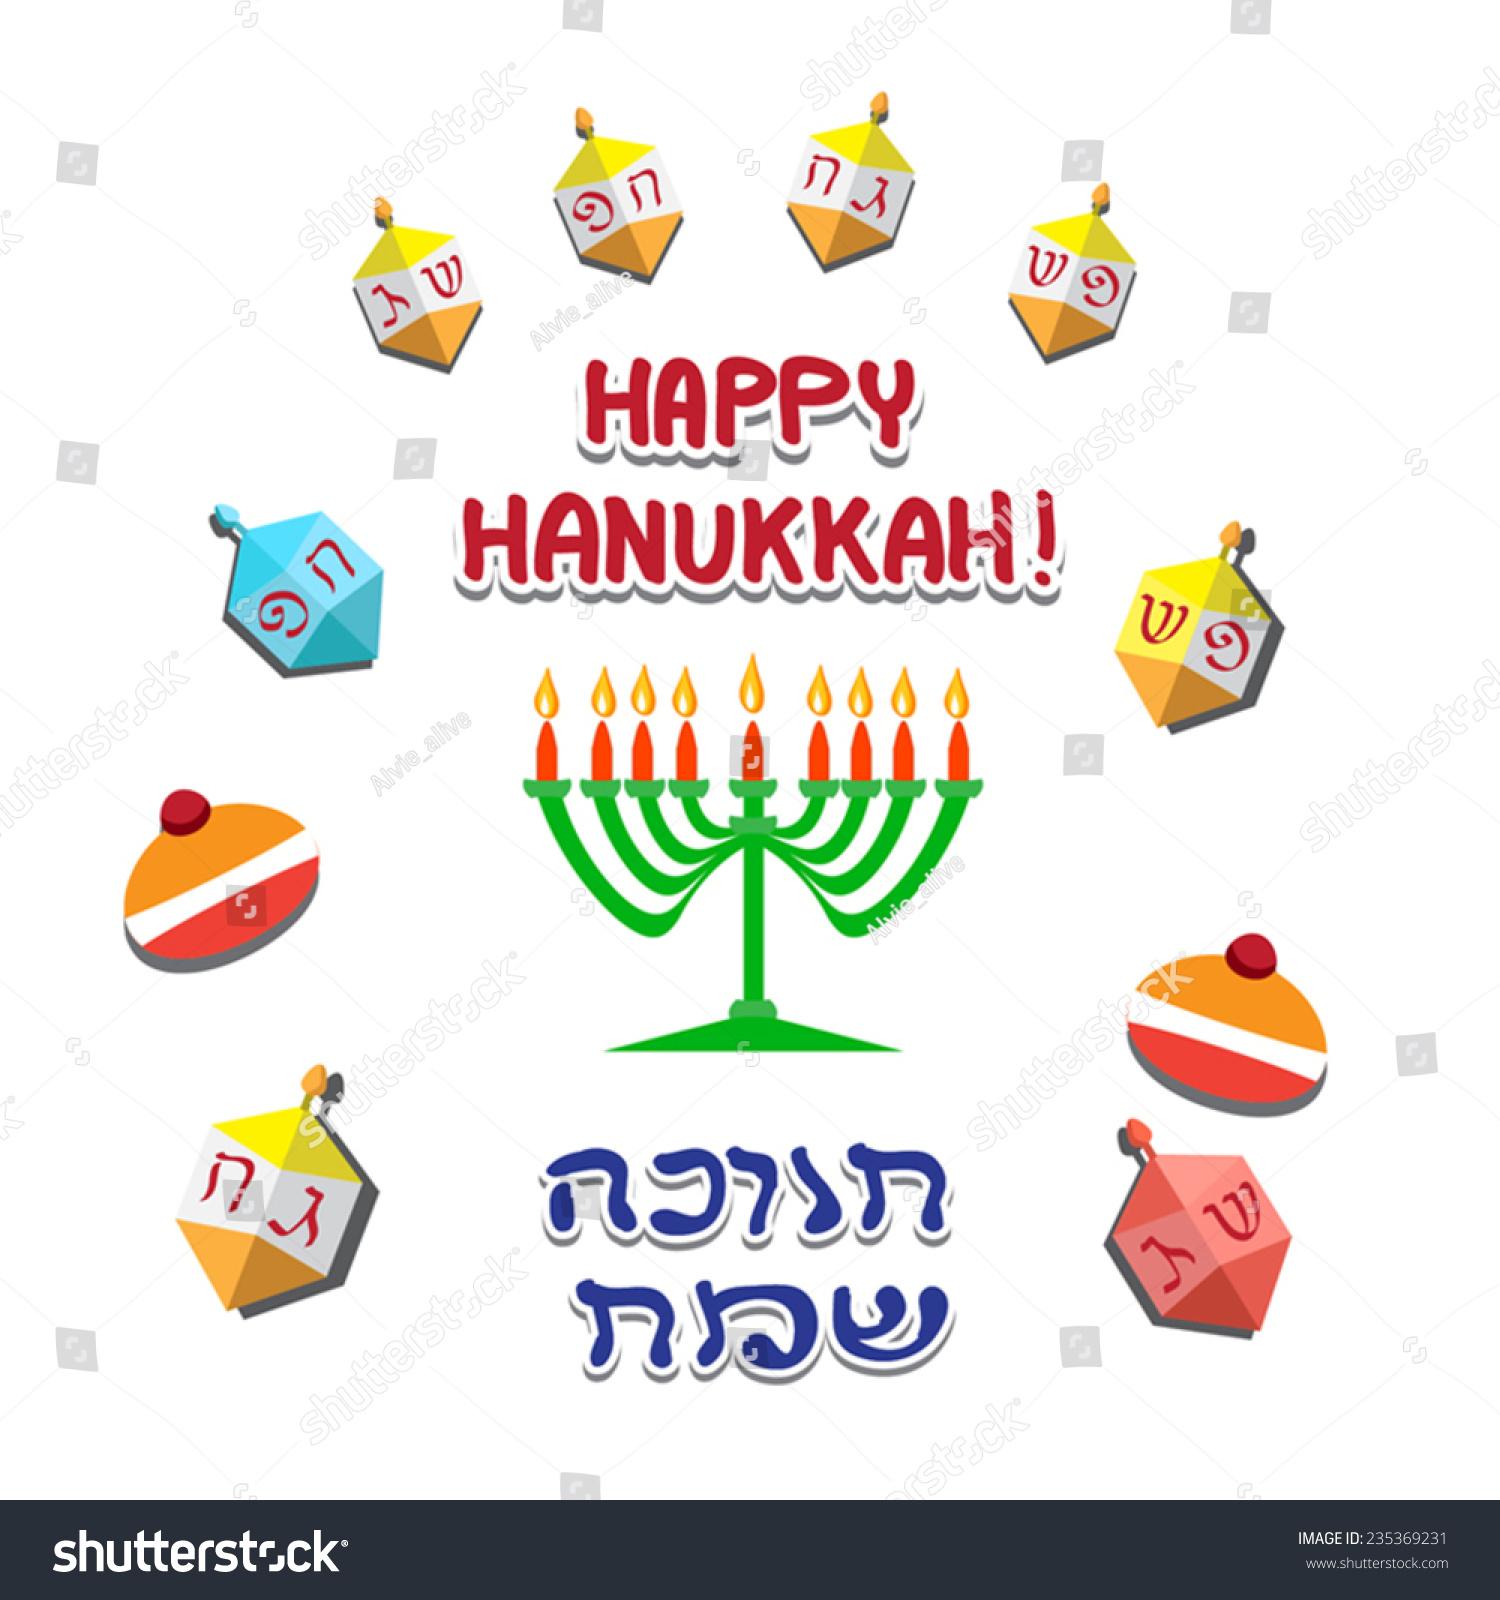 Hanukkah greeting card vector illustration menorah stock vector hanukkah greeting card vector illustration of menorah candlestickdoughnut cookies and multicolor draidels m4hsunfo